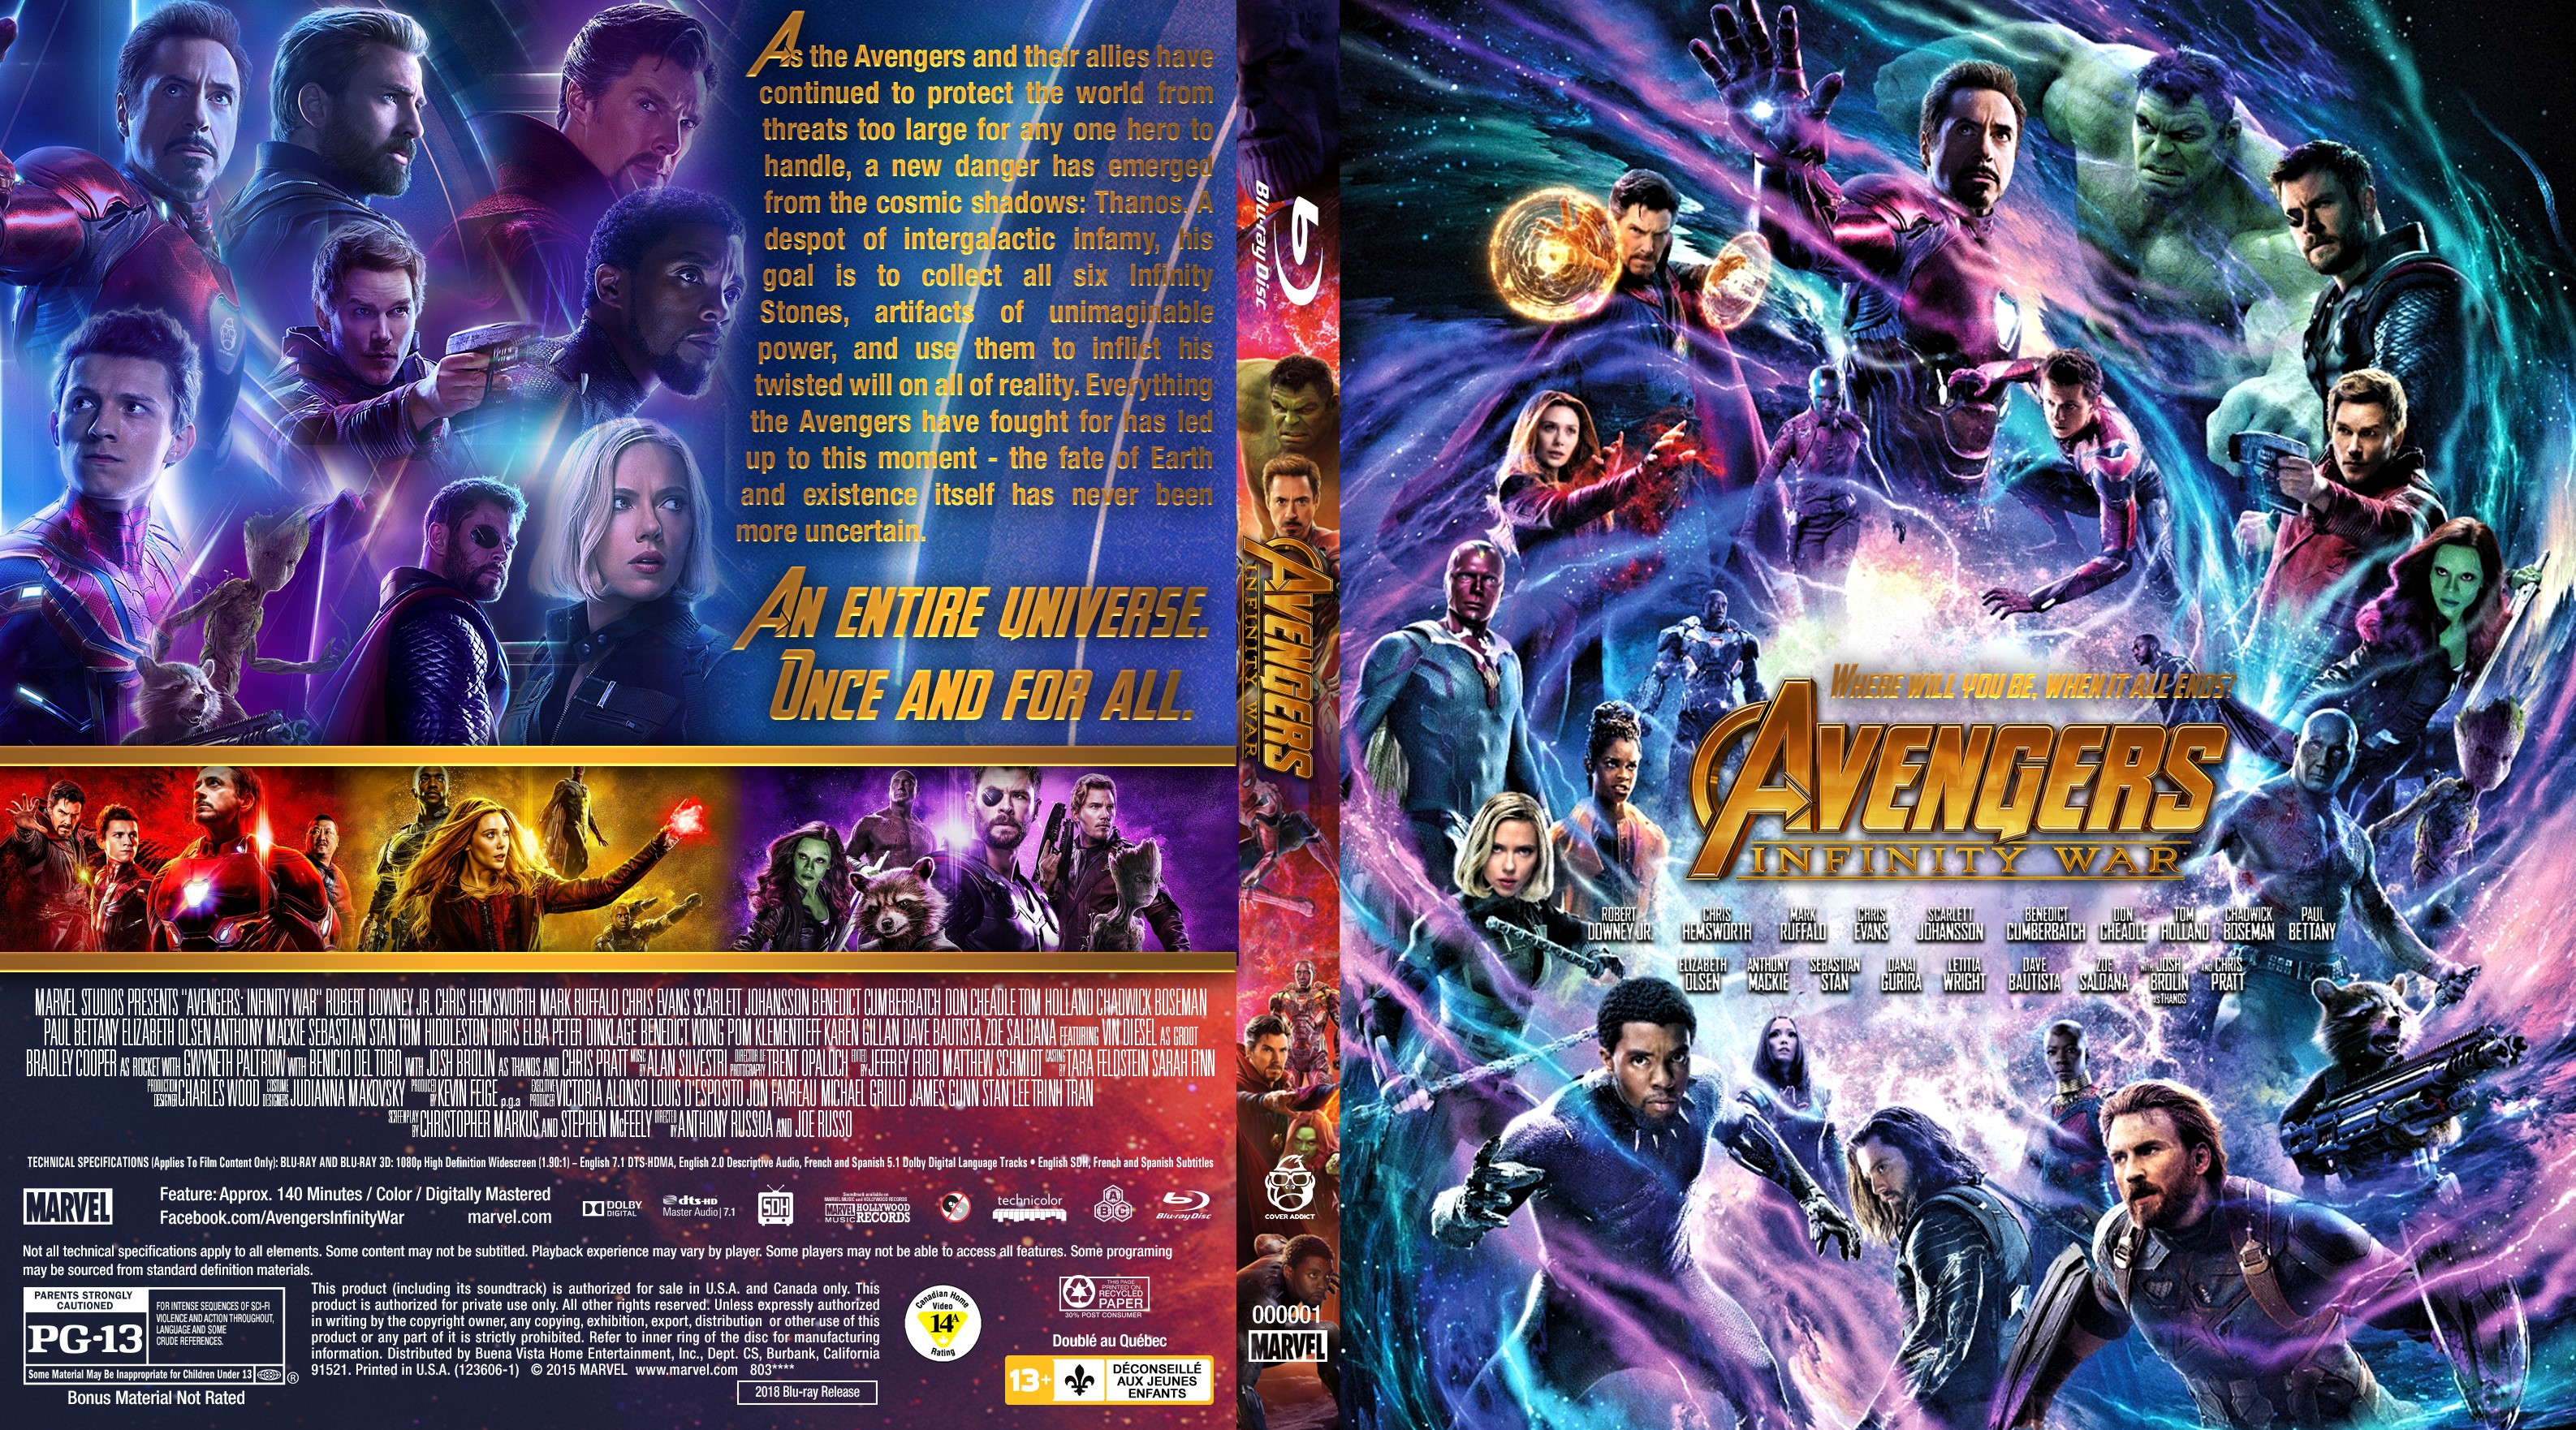 300 Full Movie >> Avengers: Infinity War Bluray Cover - Cover Addict - DVD ...